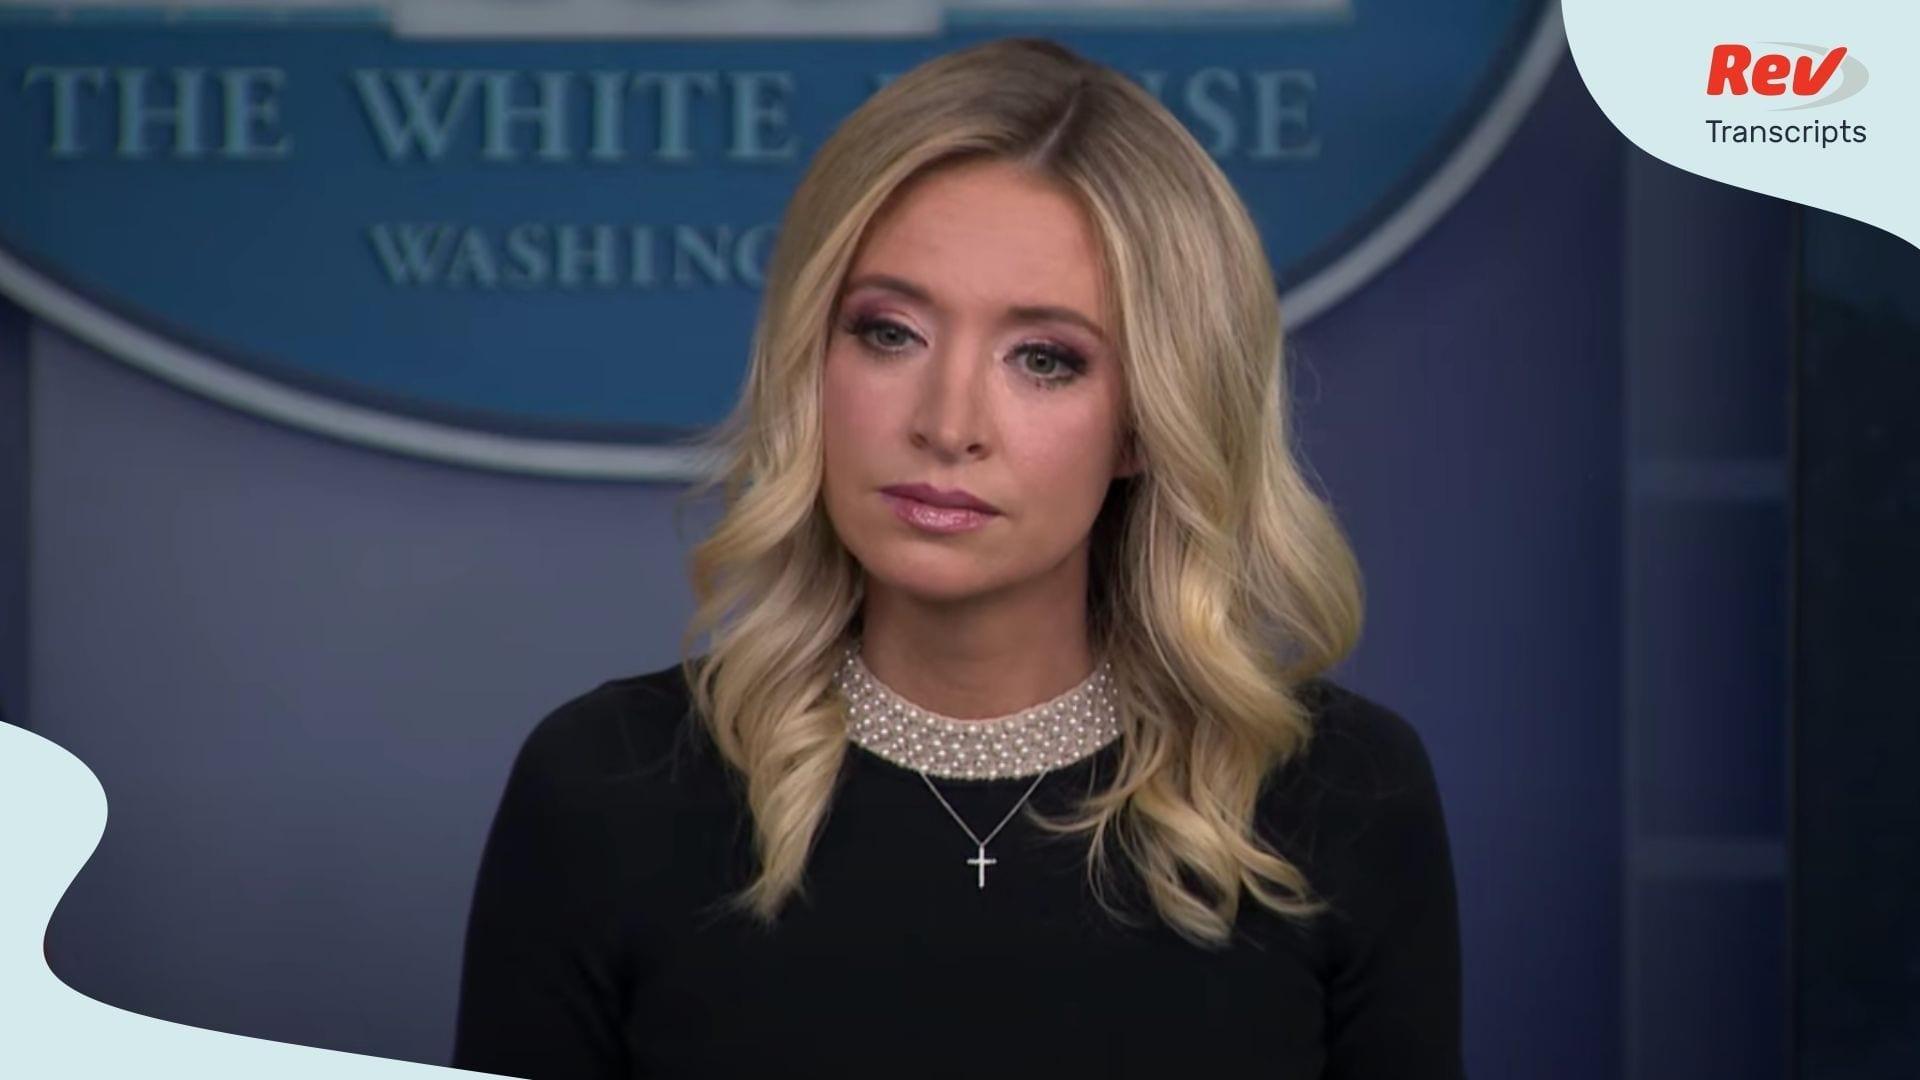 White House Press Secretary Briefing May 15